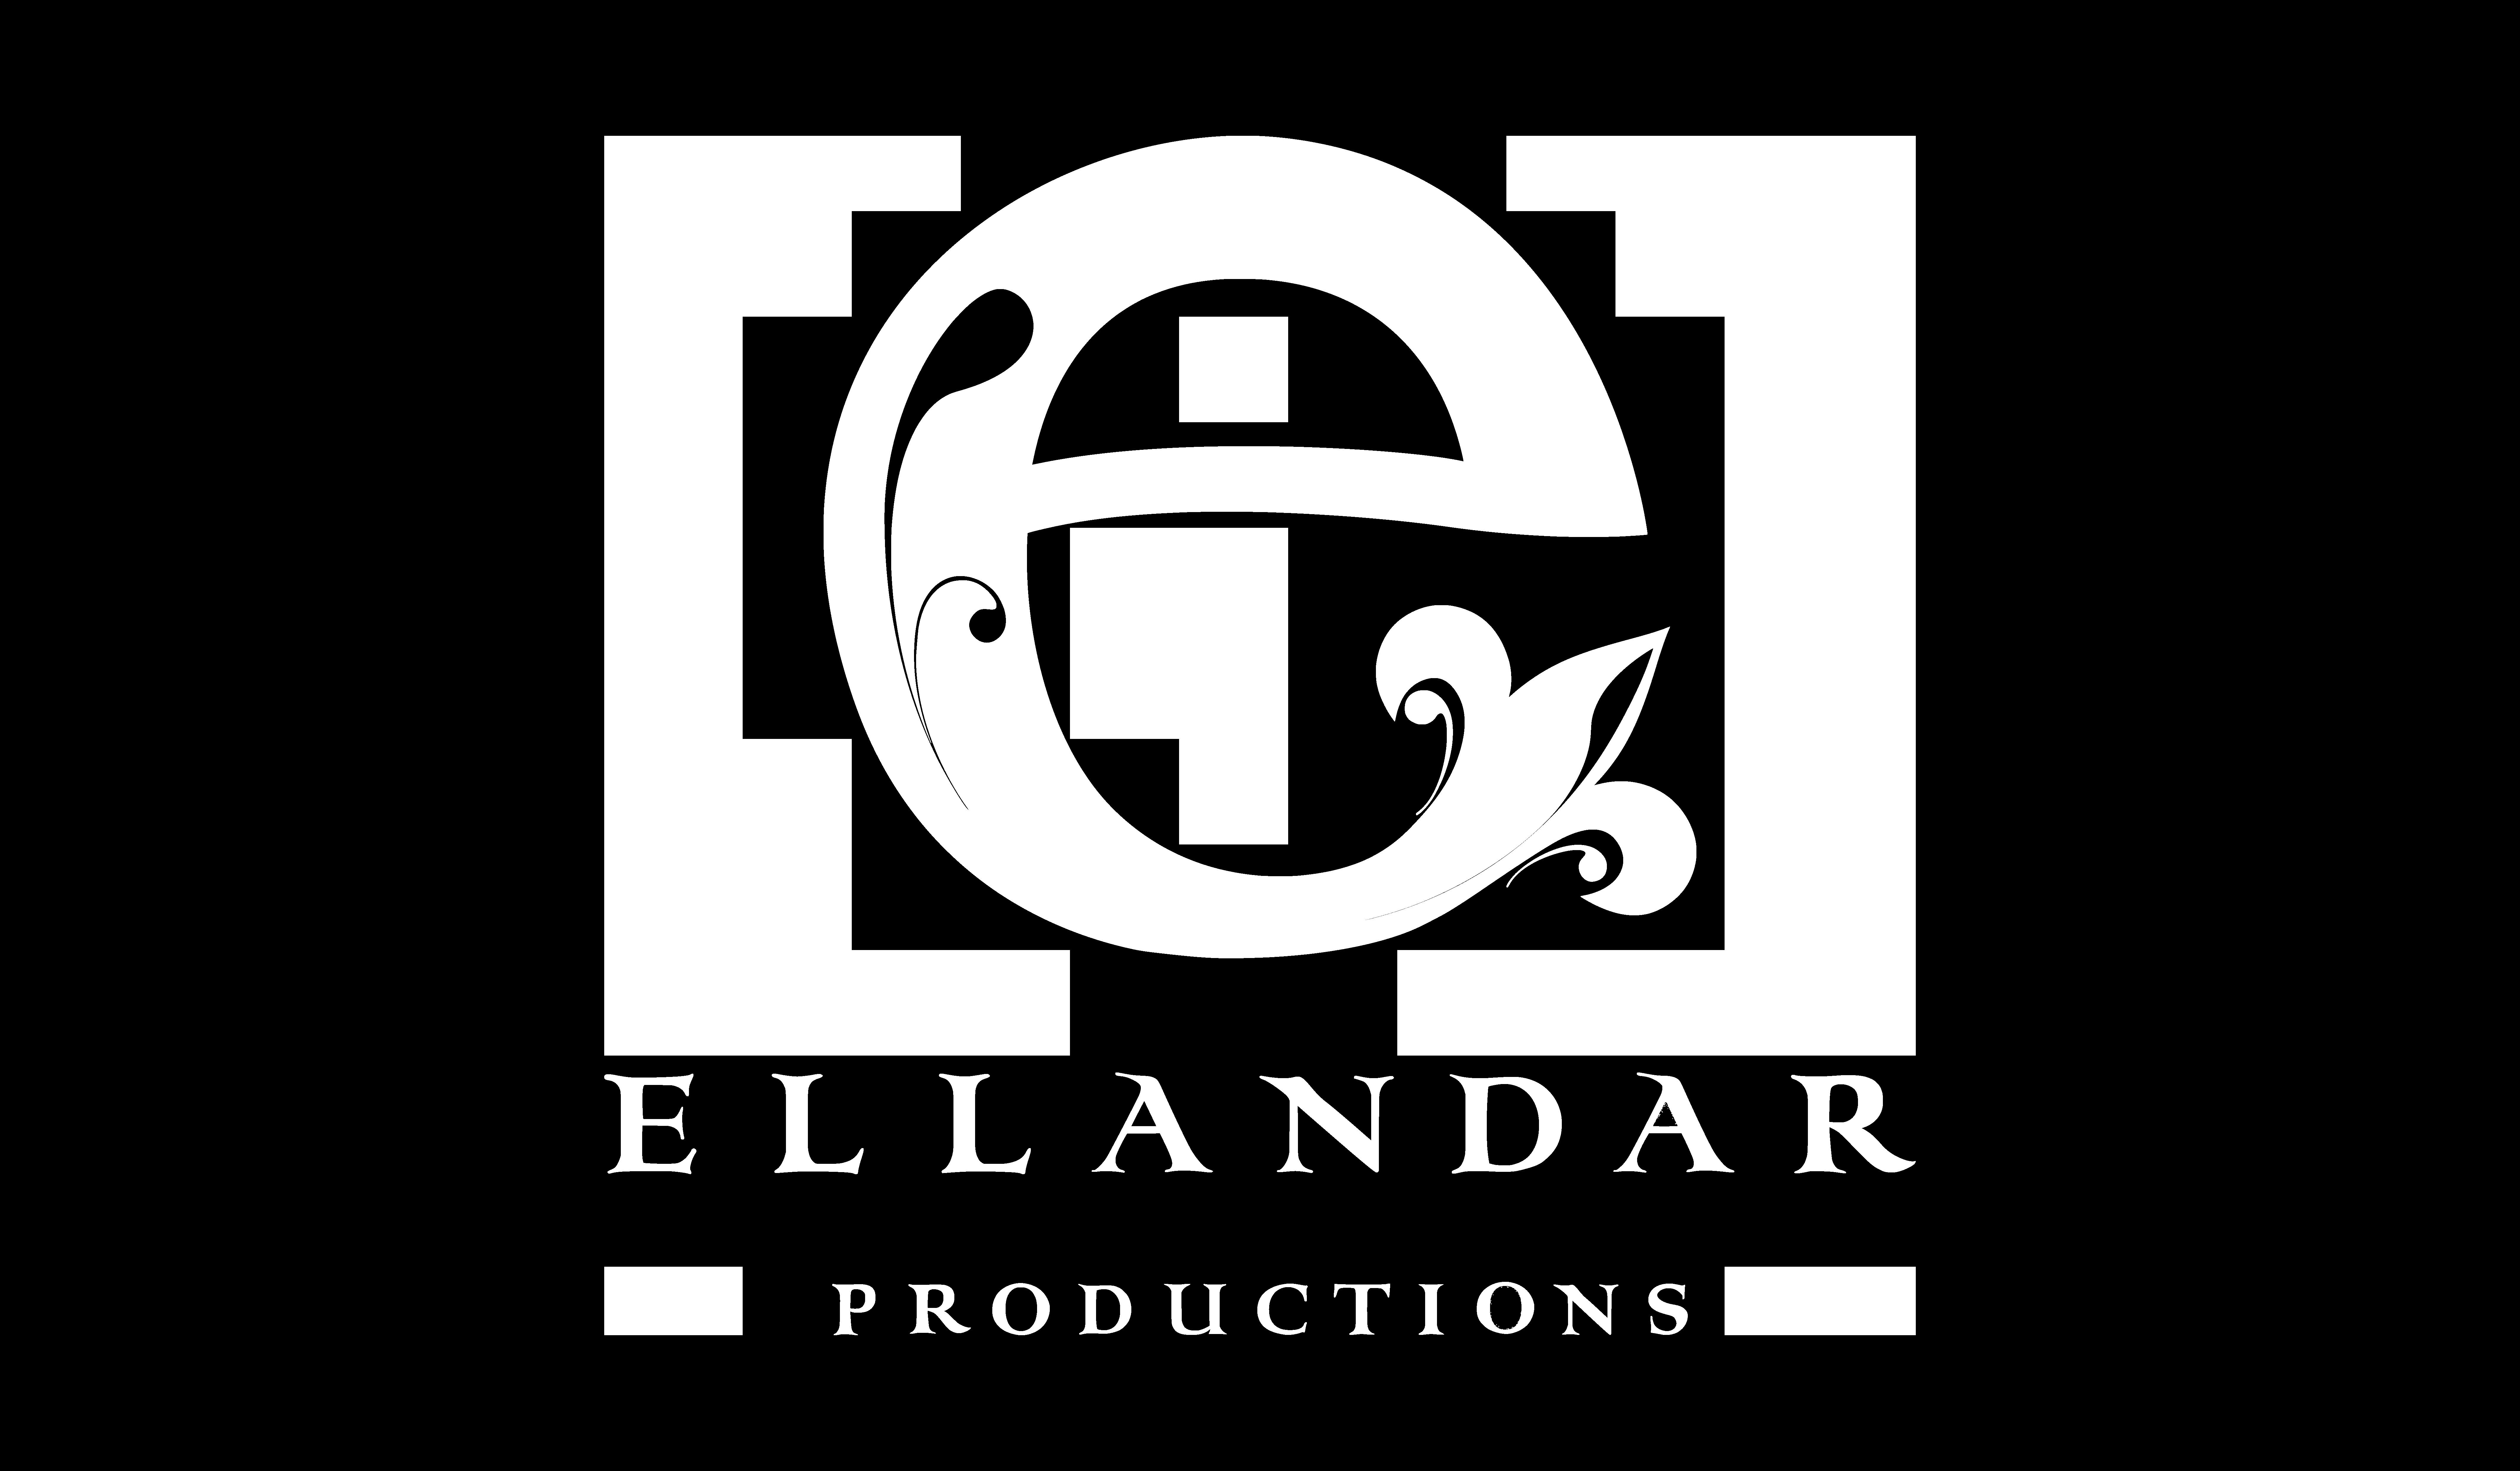 ellandar_logo_strip